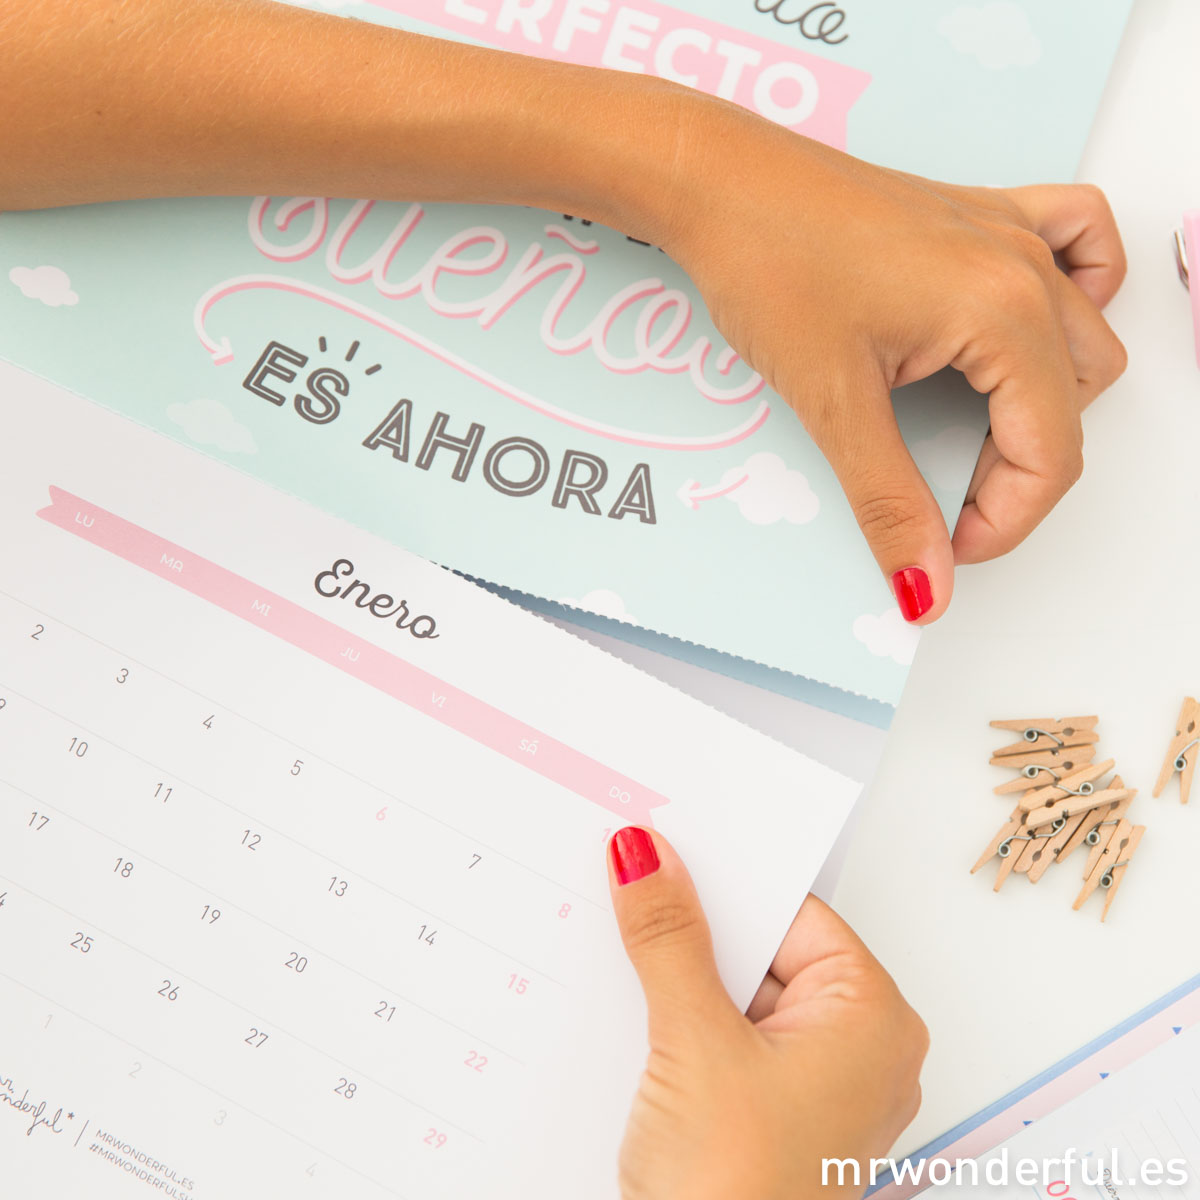 mrwonderful_8435460708371_WOA03743ES_Calendario-de-pared-2017-Un-ano-para-reír-bailar_ES-26-Editar